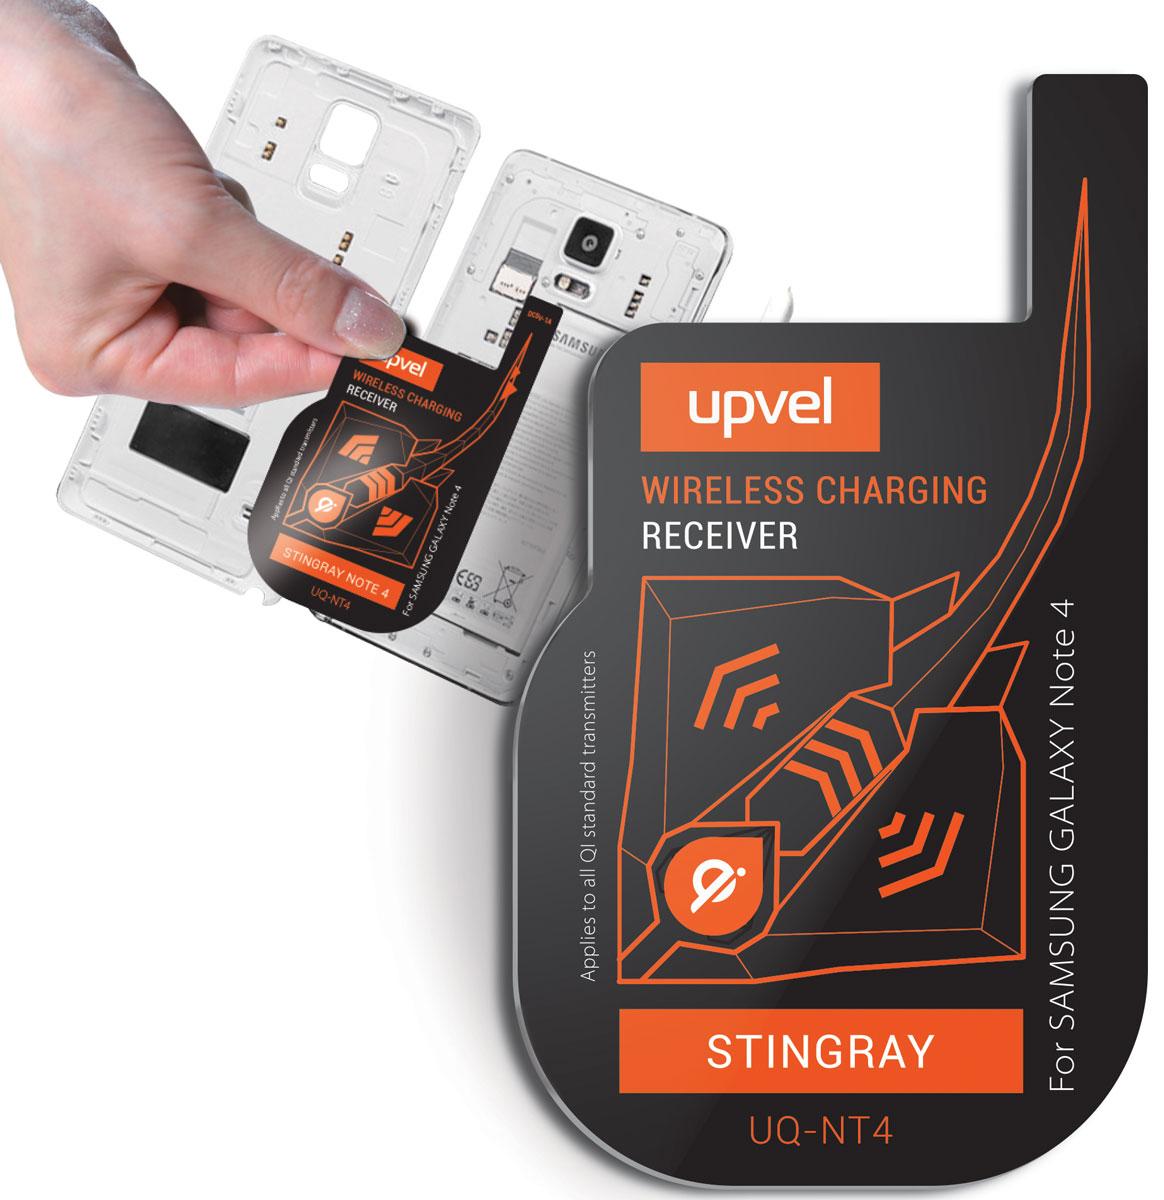 UPVEL UQ-NT4 Stingray для Samsung Galaxy Note 4, Black модуль-приемник беспроводной зарядки стандарта Qi